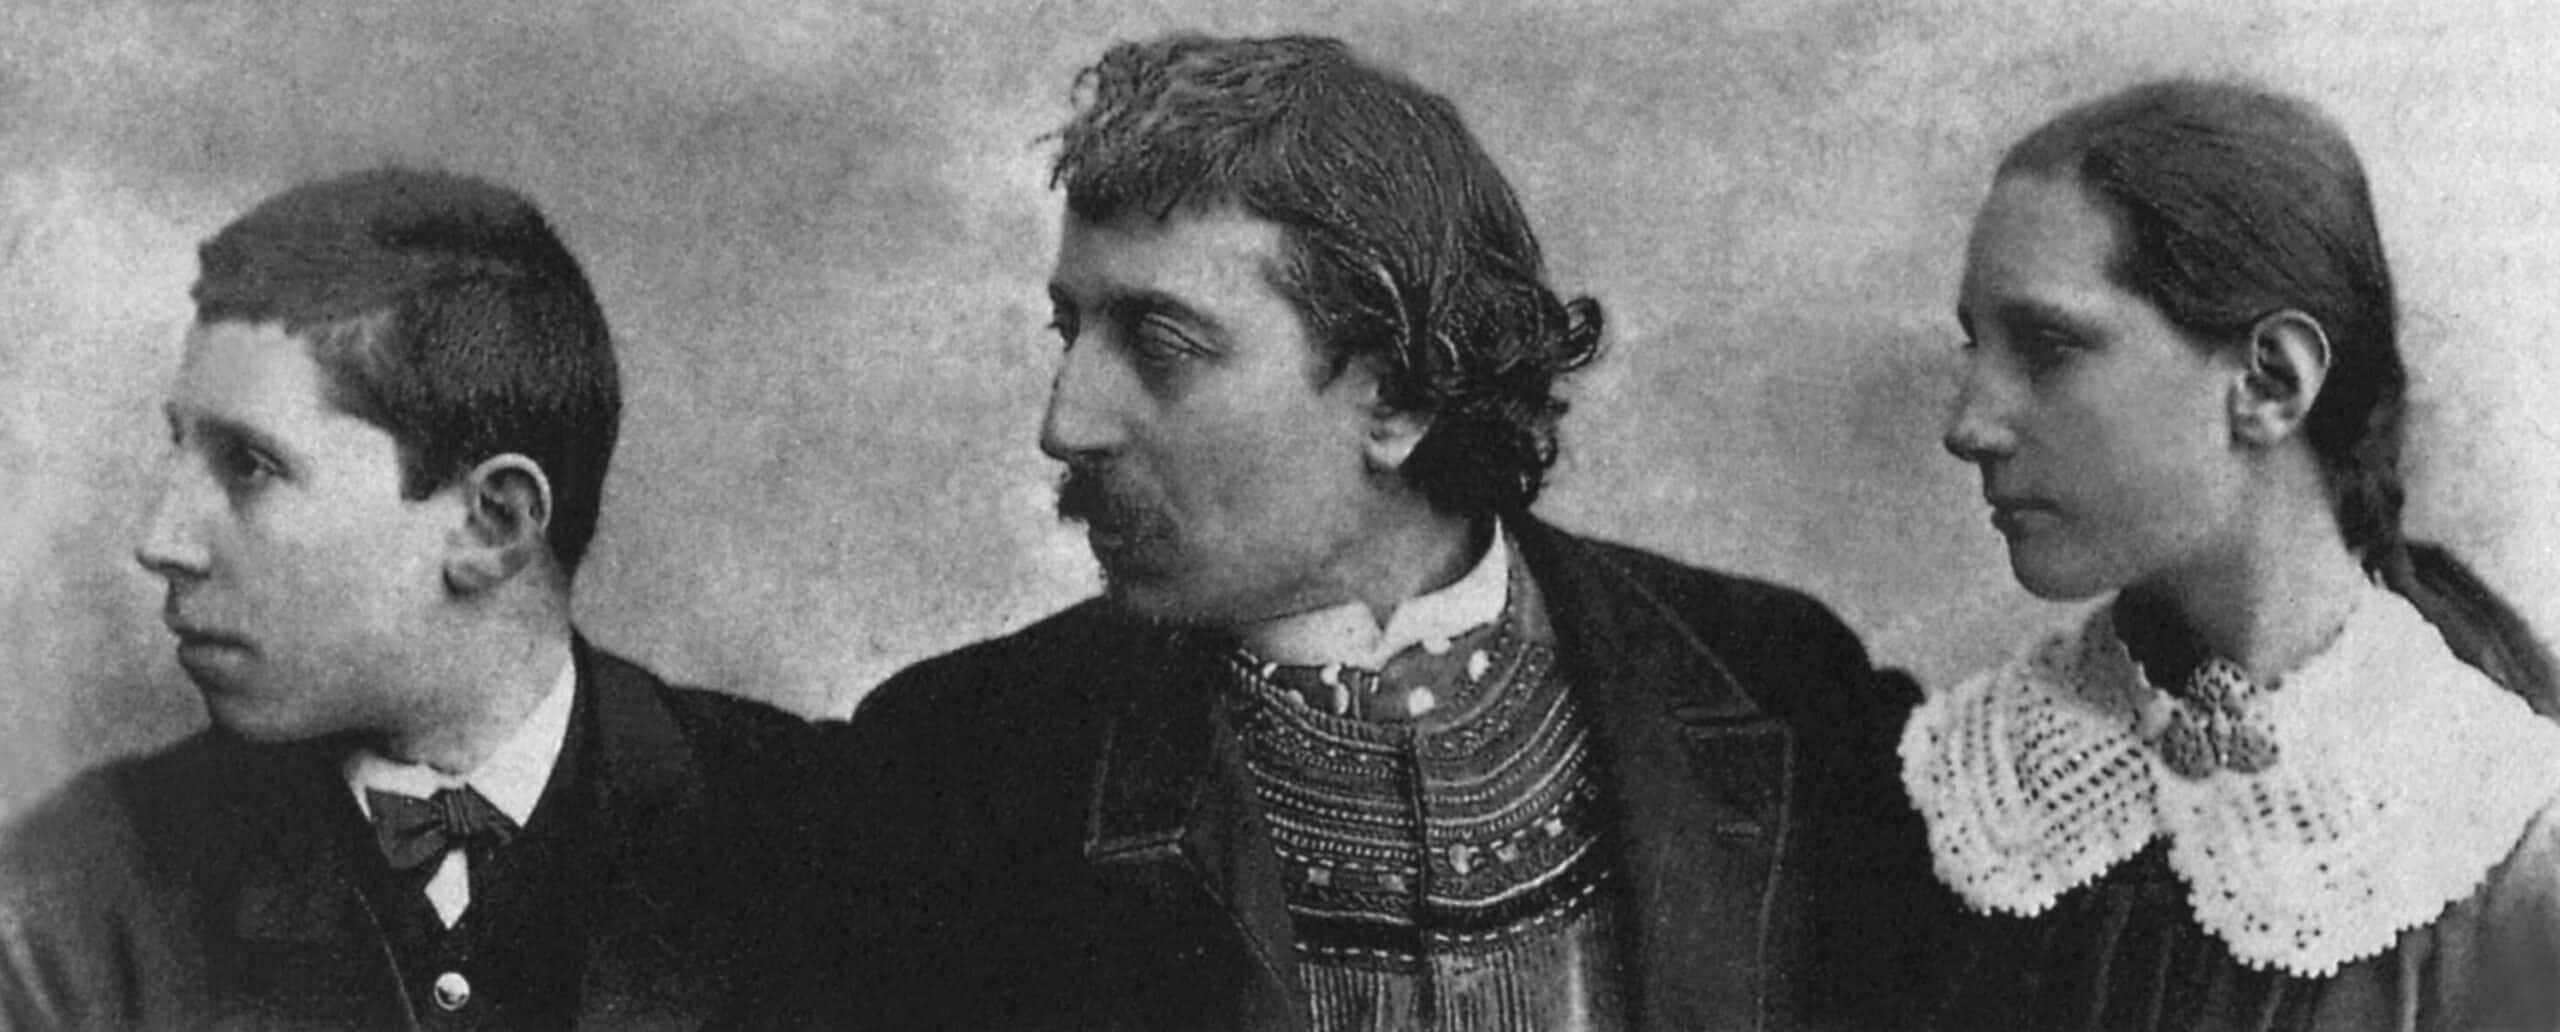 Paul Gauguin facts